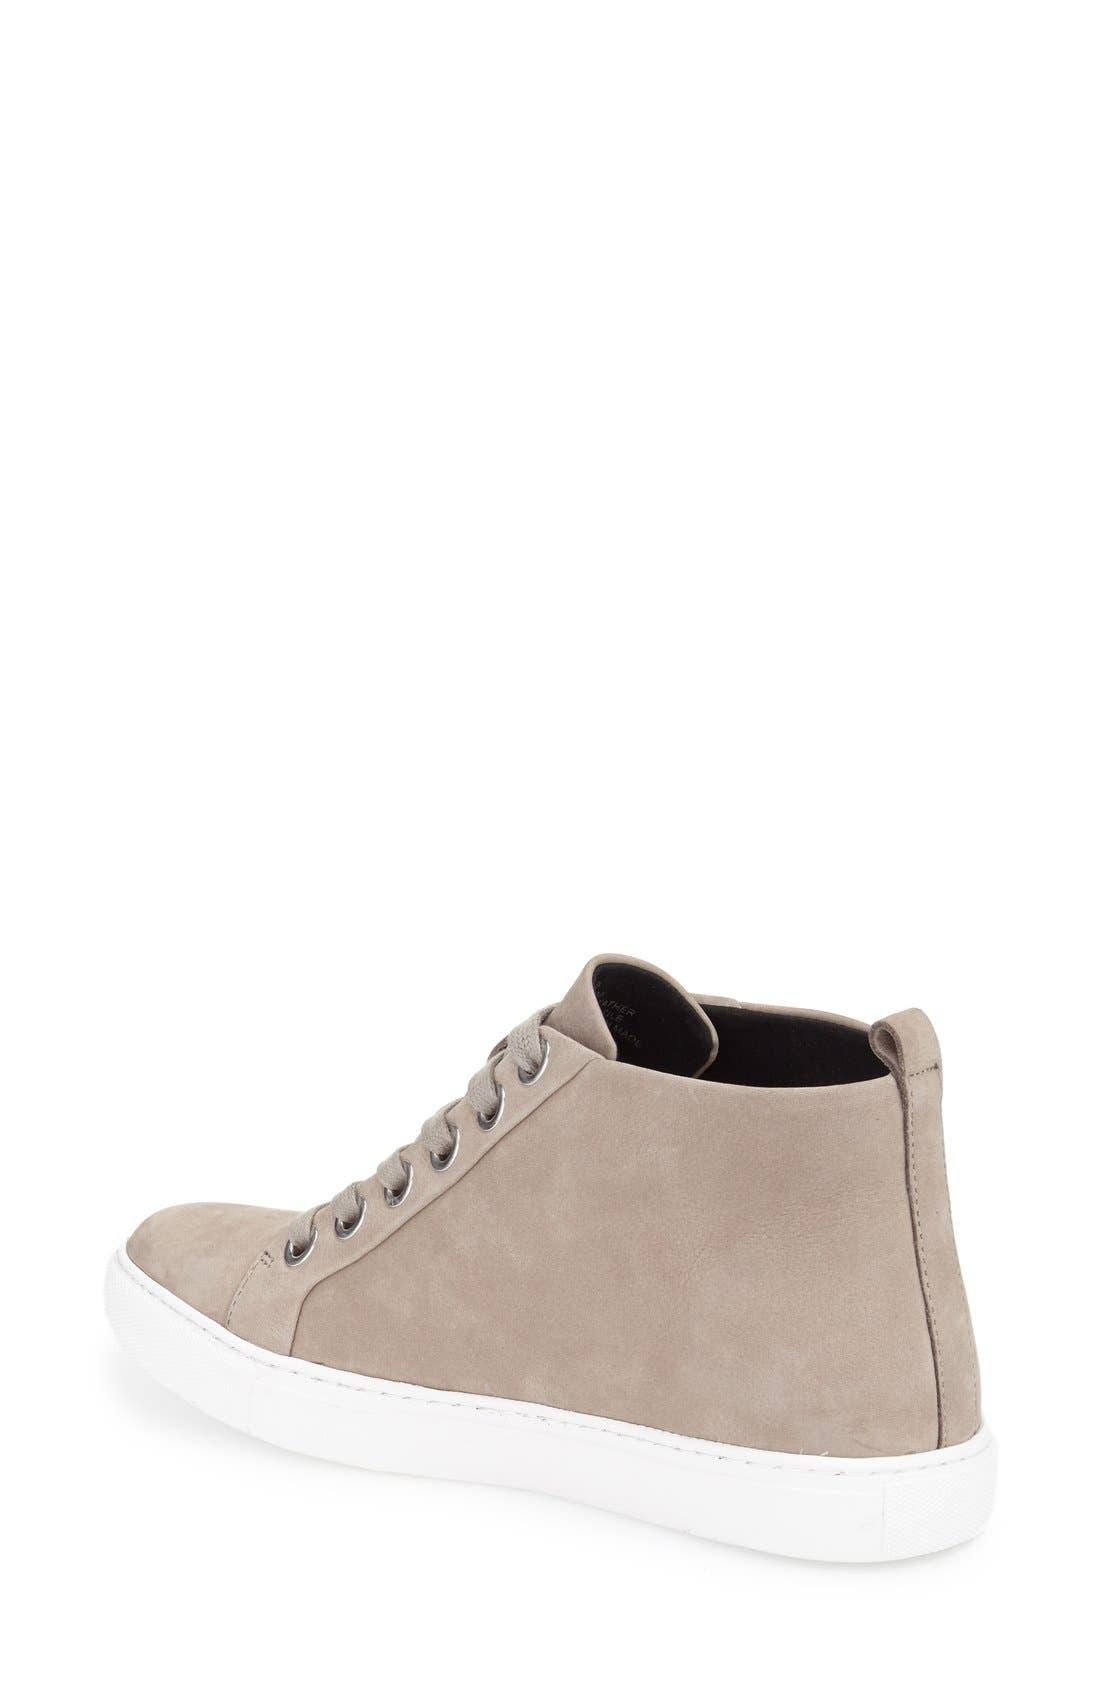 'Kaleb' High Top Sneaker,                             Alternate thumbnail 8, color,